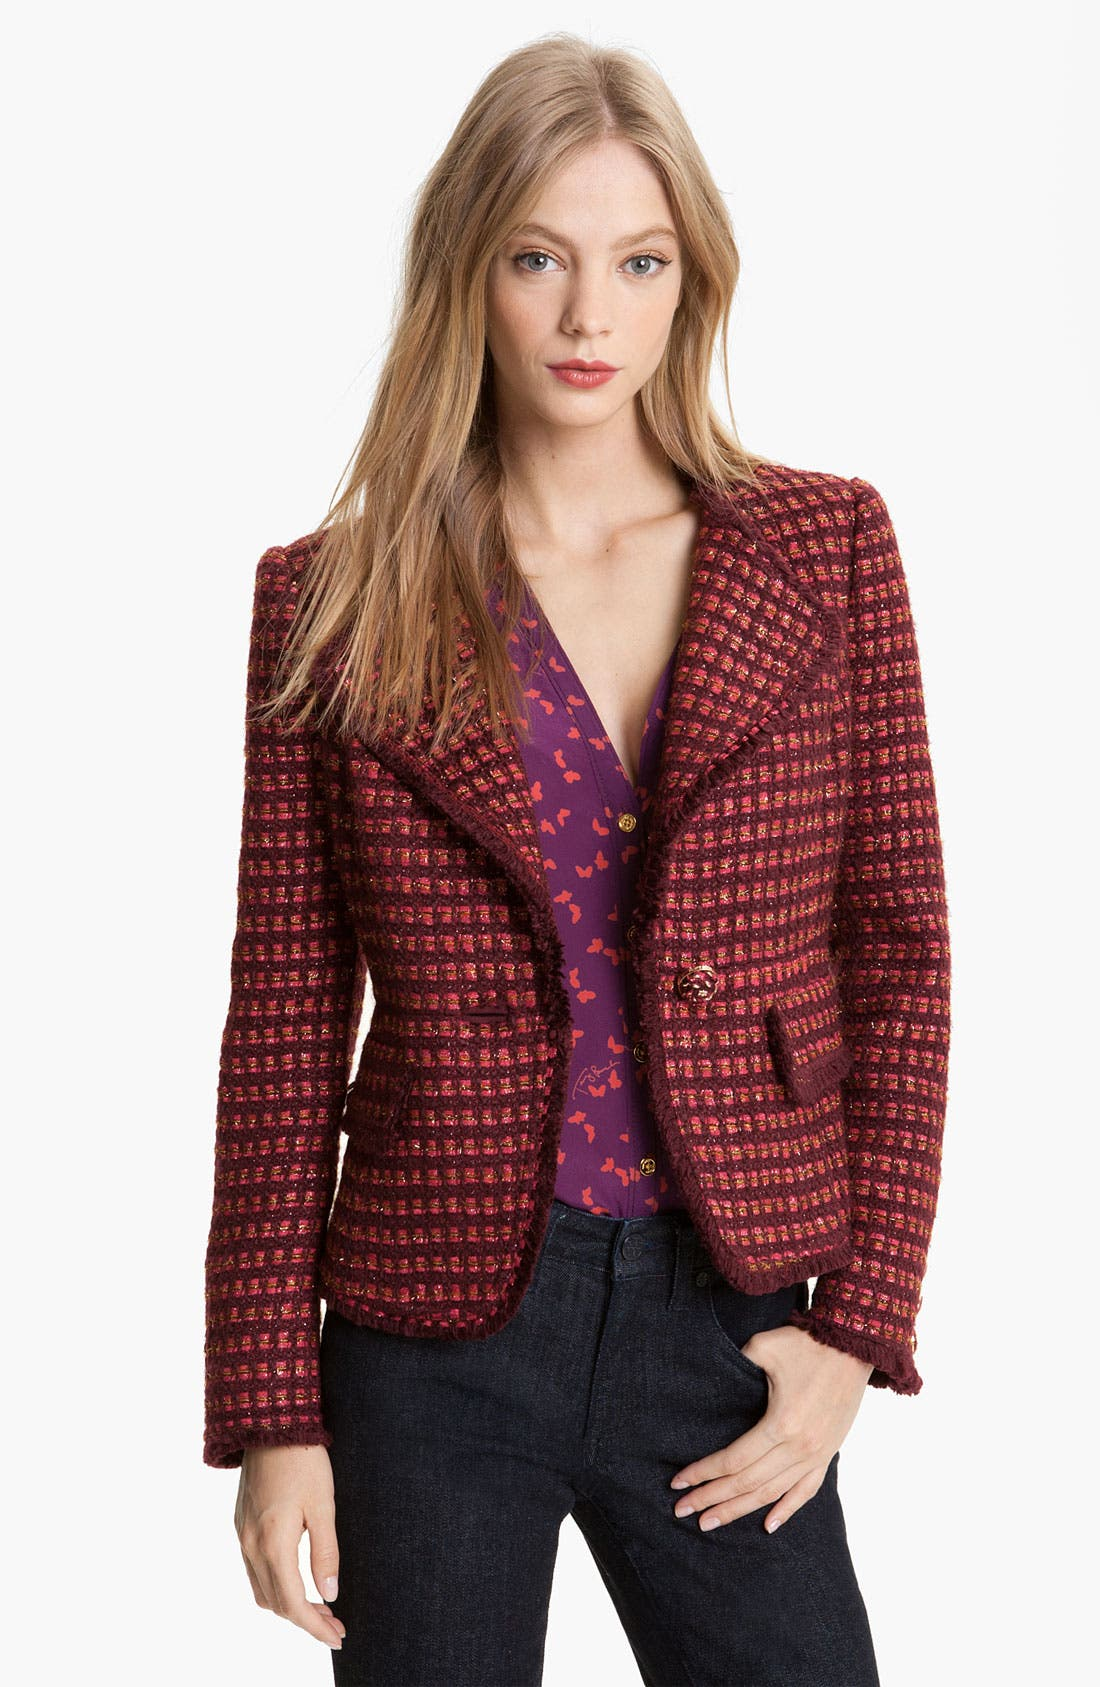 Main Image - Tory Burch 'Victory' Tweed Jacket